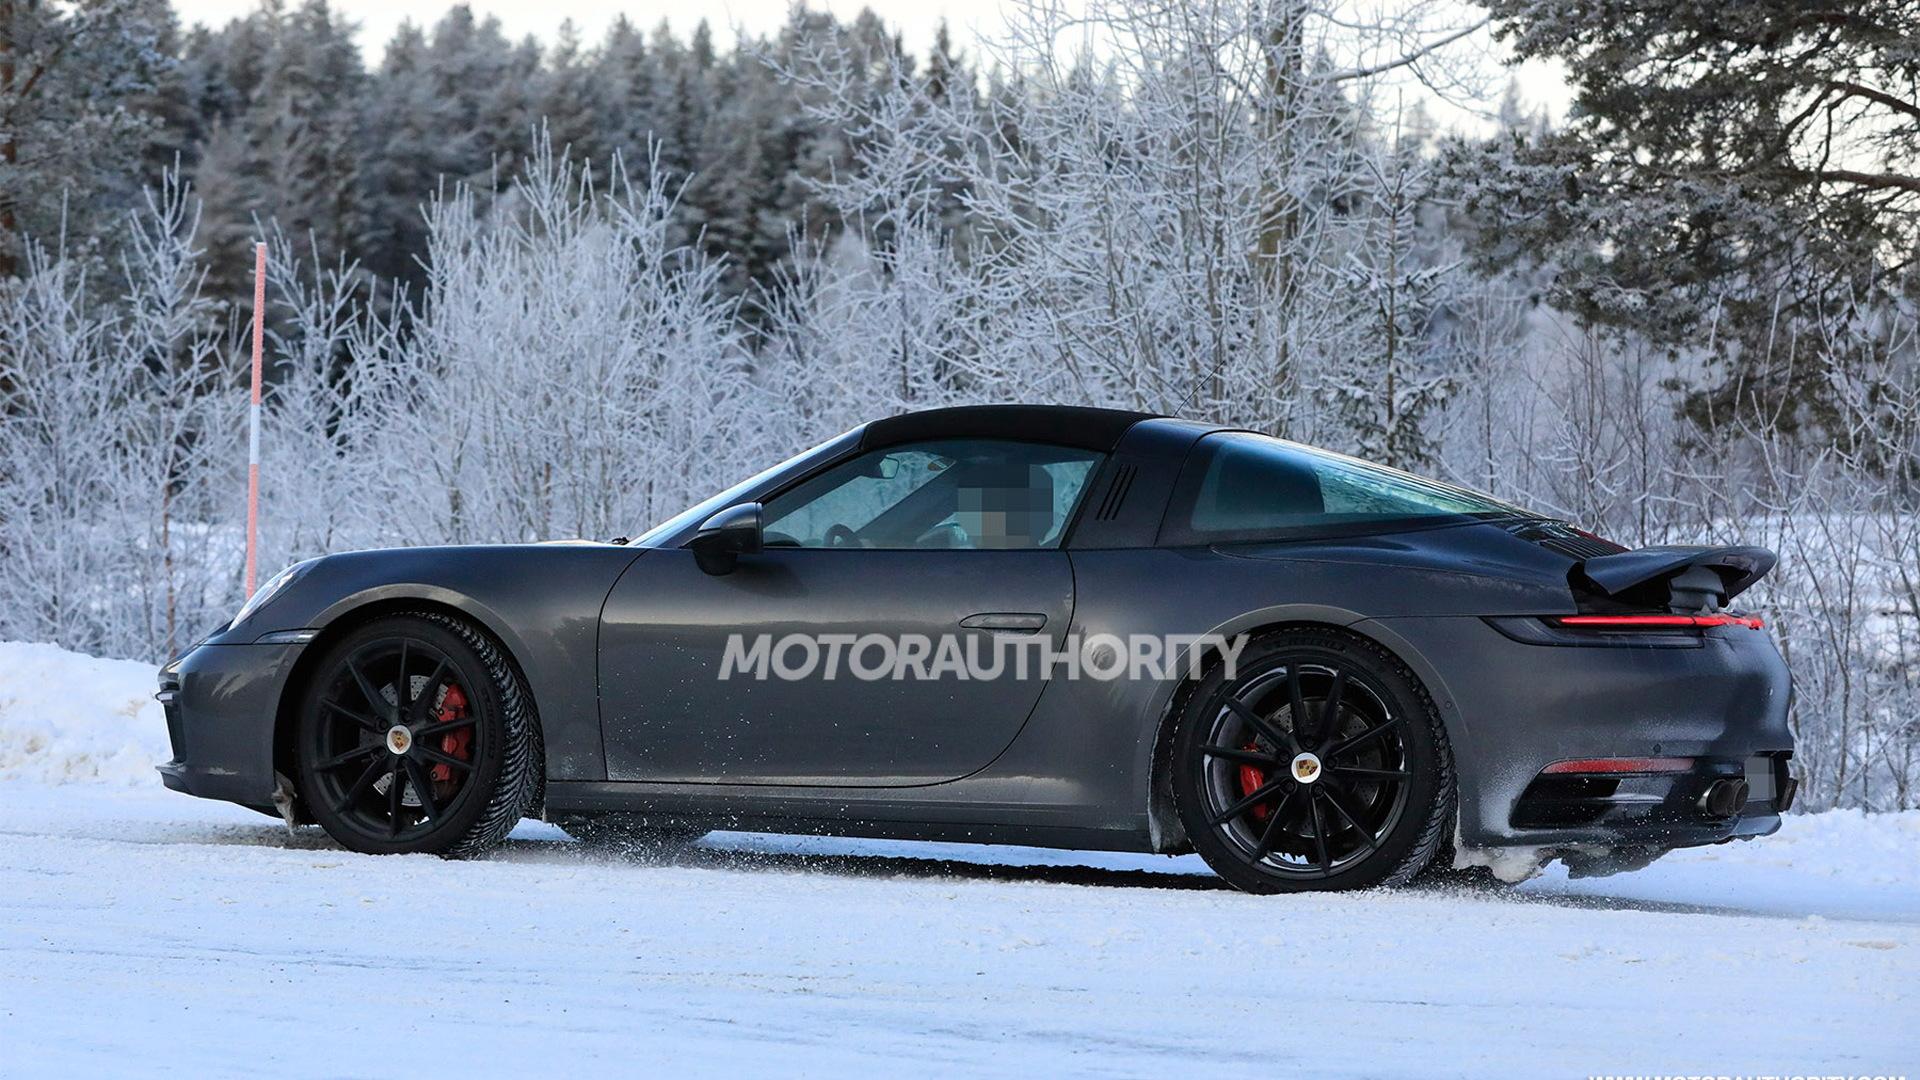 2021 Porsche 911 Targa spy shots - Photo credit: S. Baldauf/SB-Medien